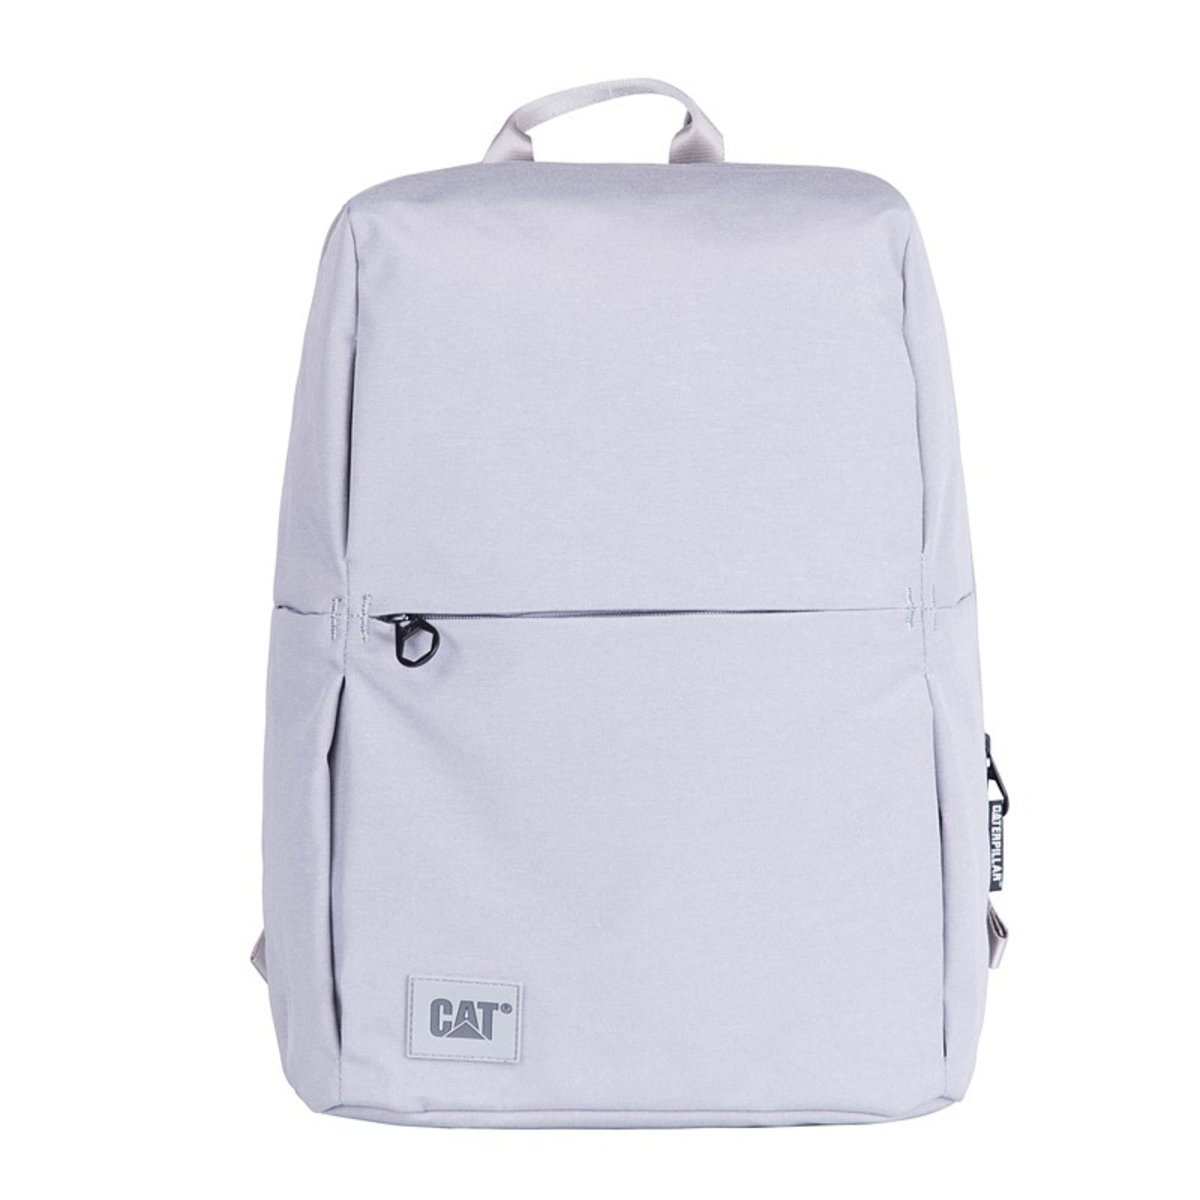 Mono Inno Backpack (Grey) 背包 背囊 旅遊外出必備